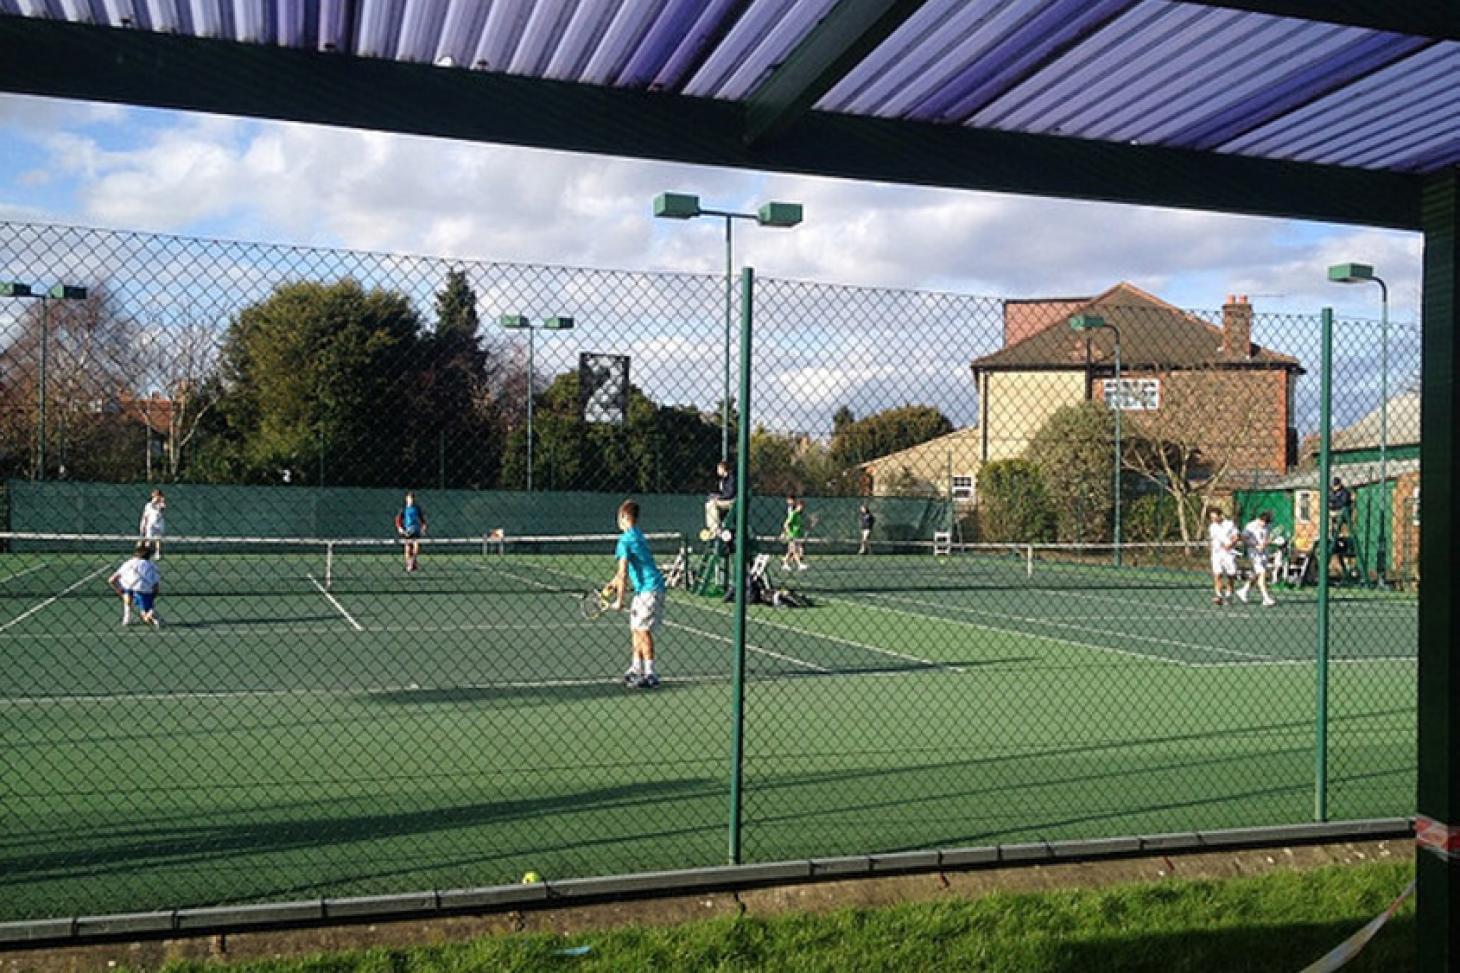 Wilton Lawn Tennis Club Outdoor   Hard (macadam) tennis court